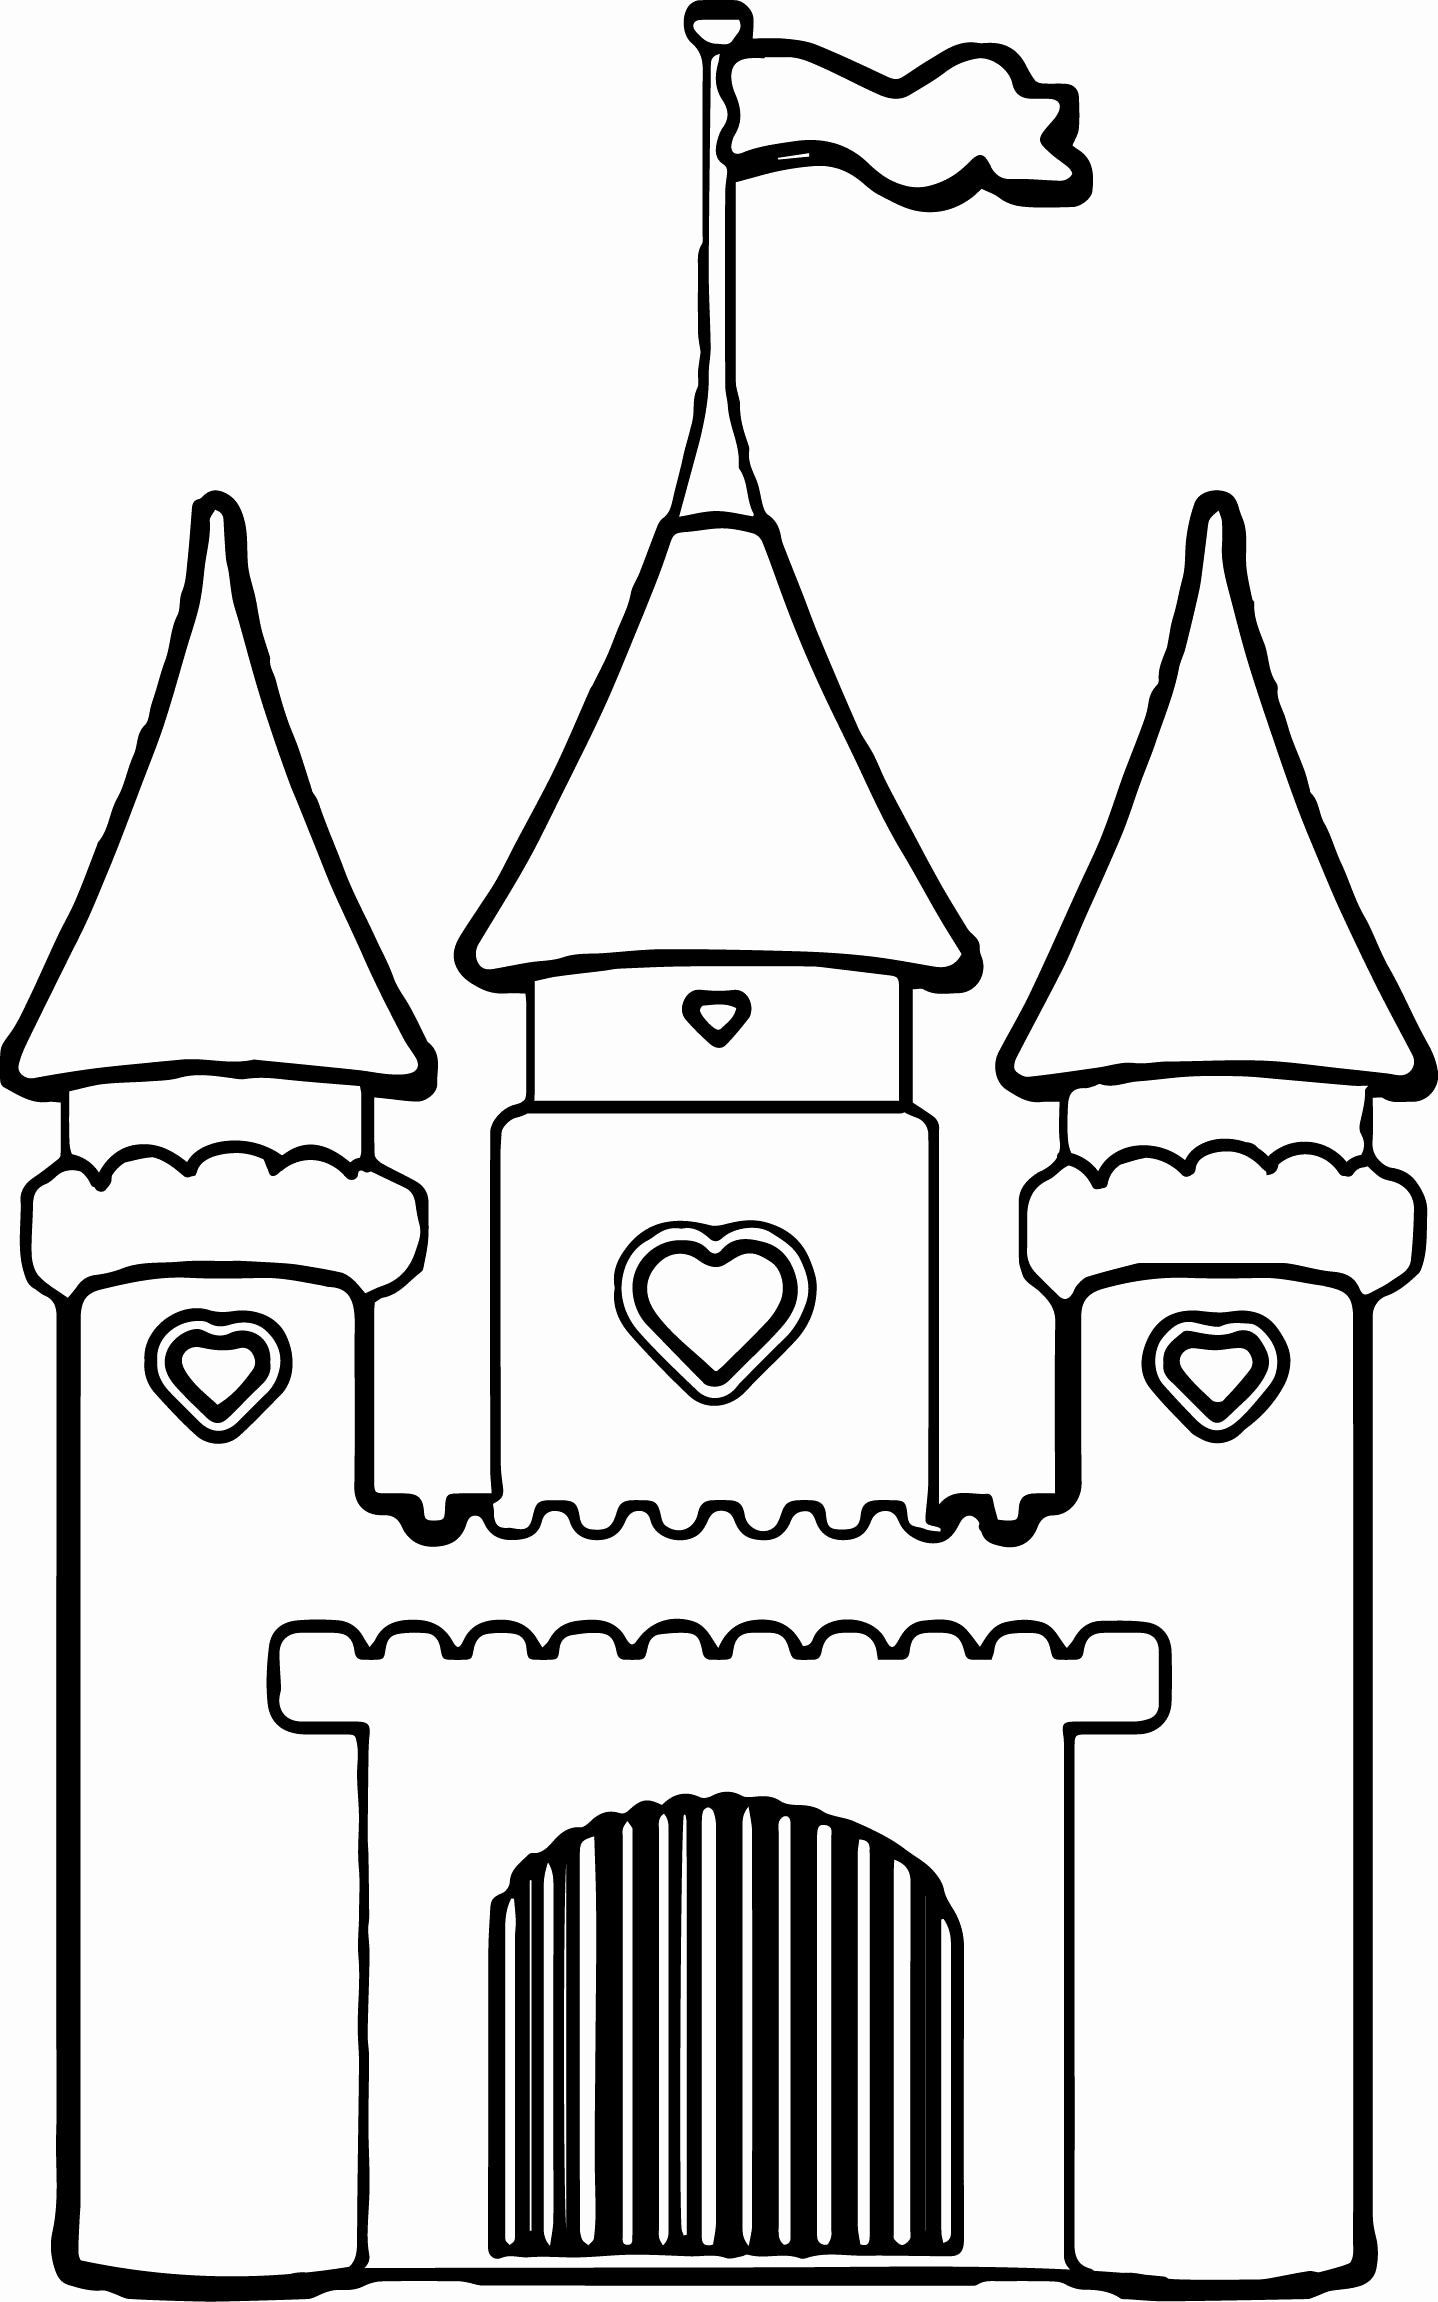 Disney Castle Coloring Page Luxury Disney Princess Castle Coloring Pages Sketch Coloring Page In 2020 Castle Coloring Page Princess Coloring Pages Coloring Pages